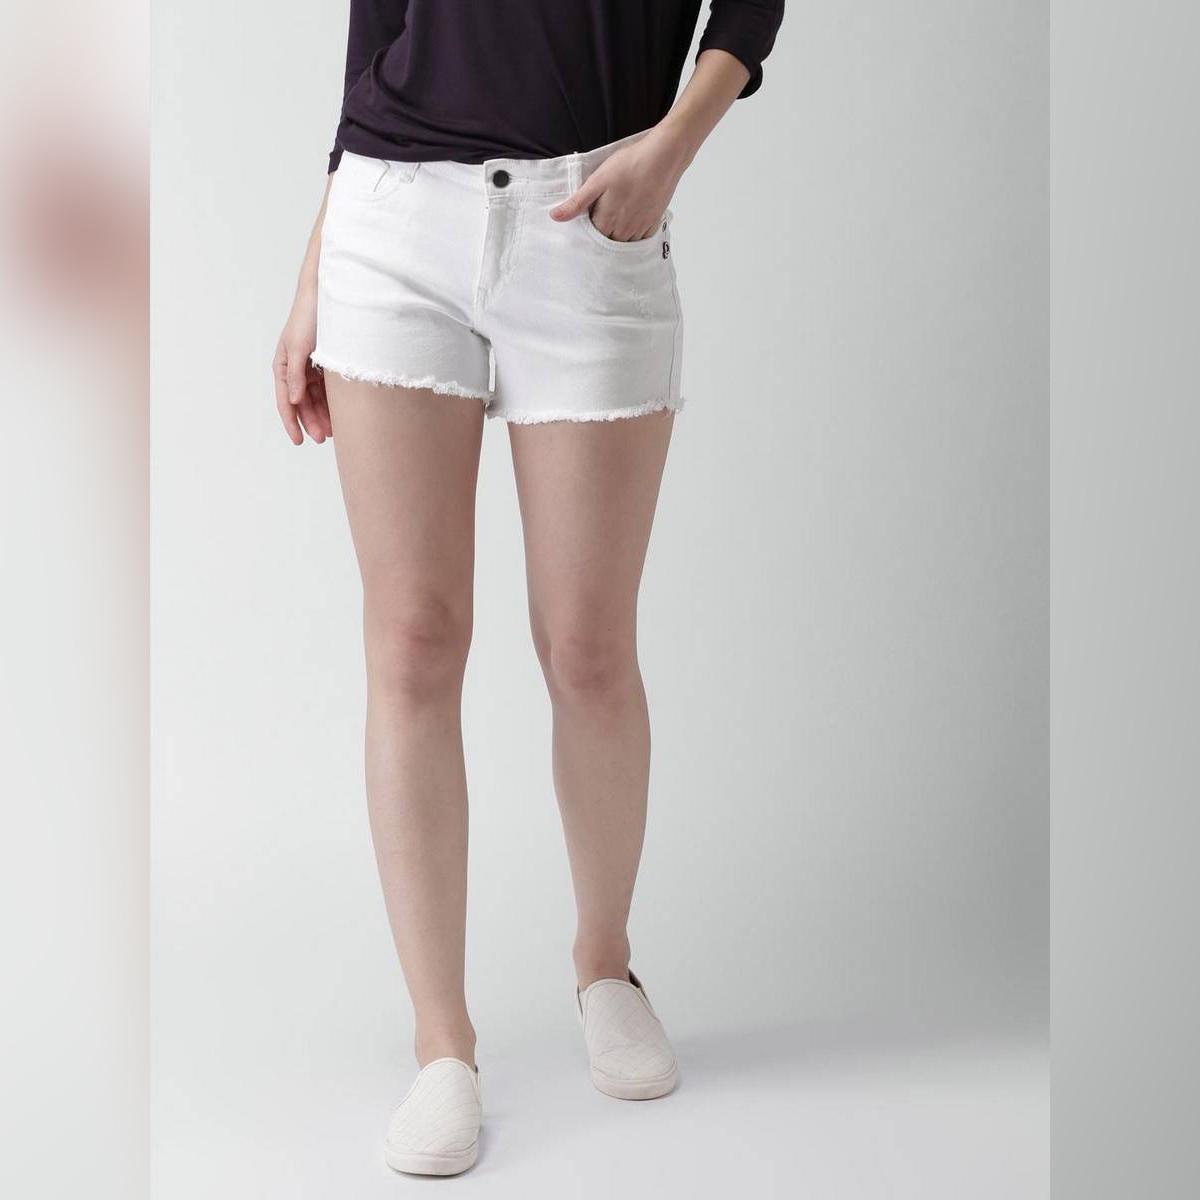 Sumera's Collection White Mini Denim Shorts For Women